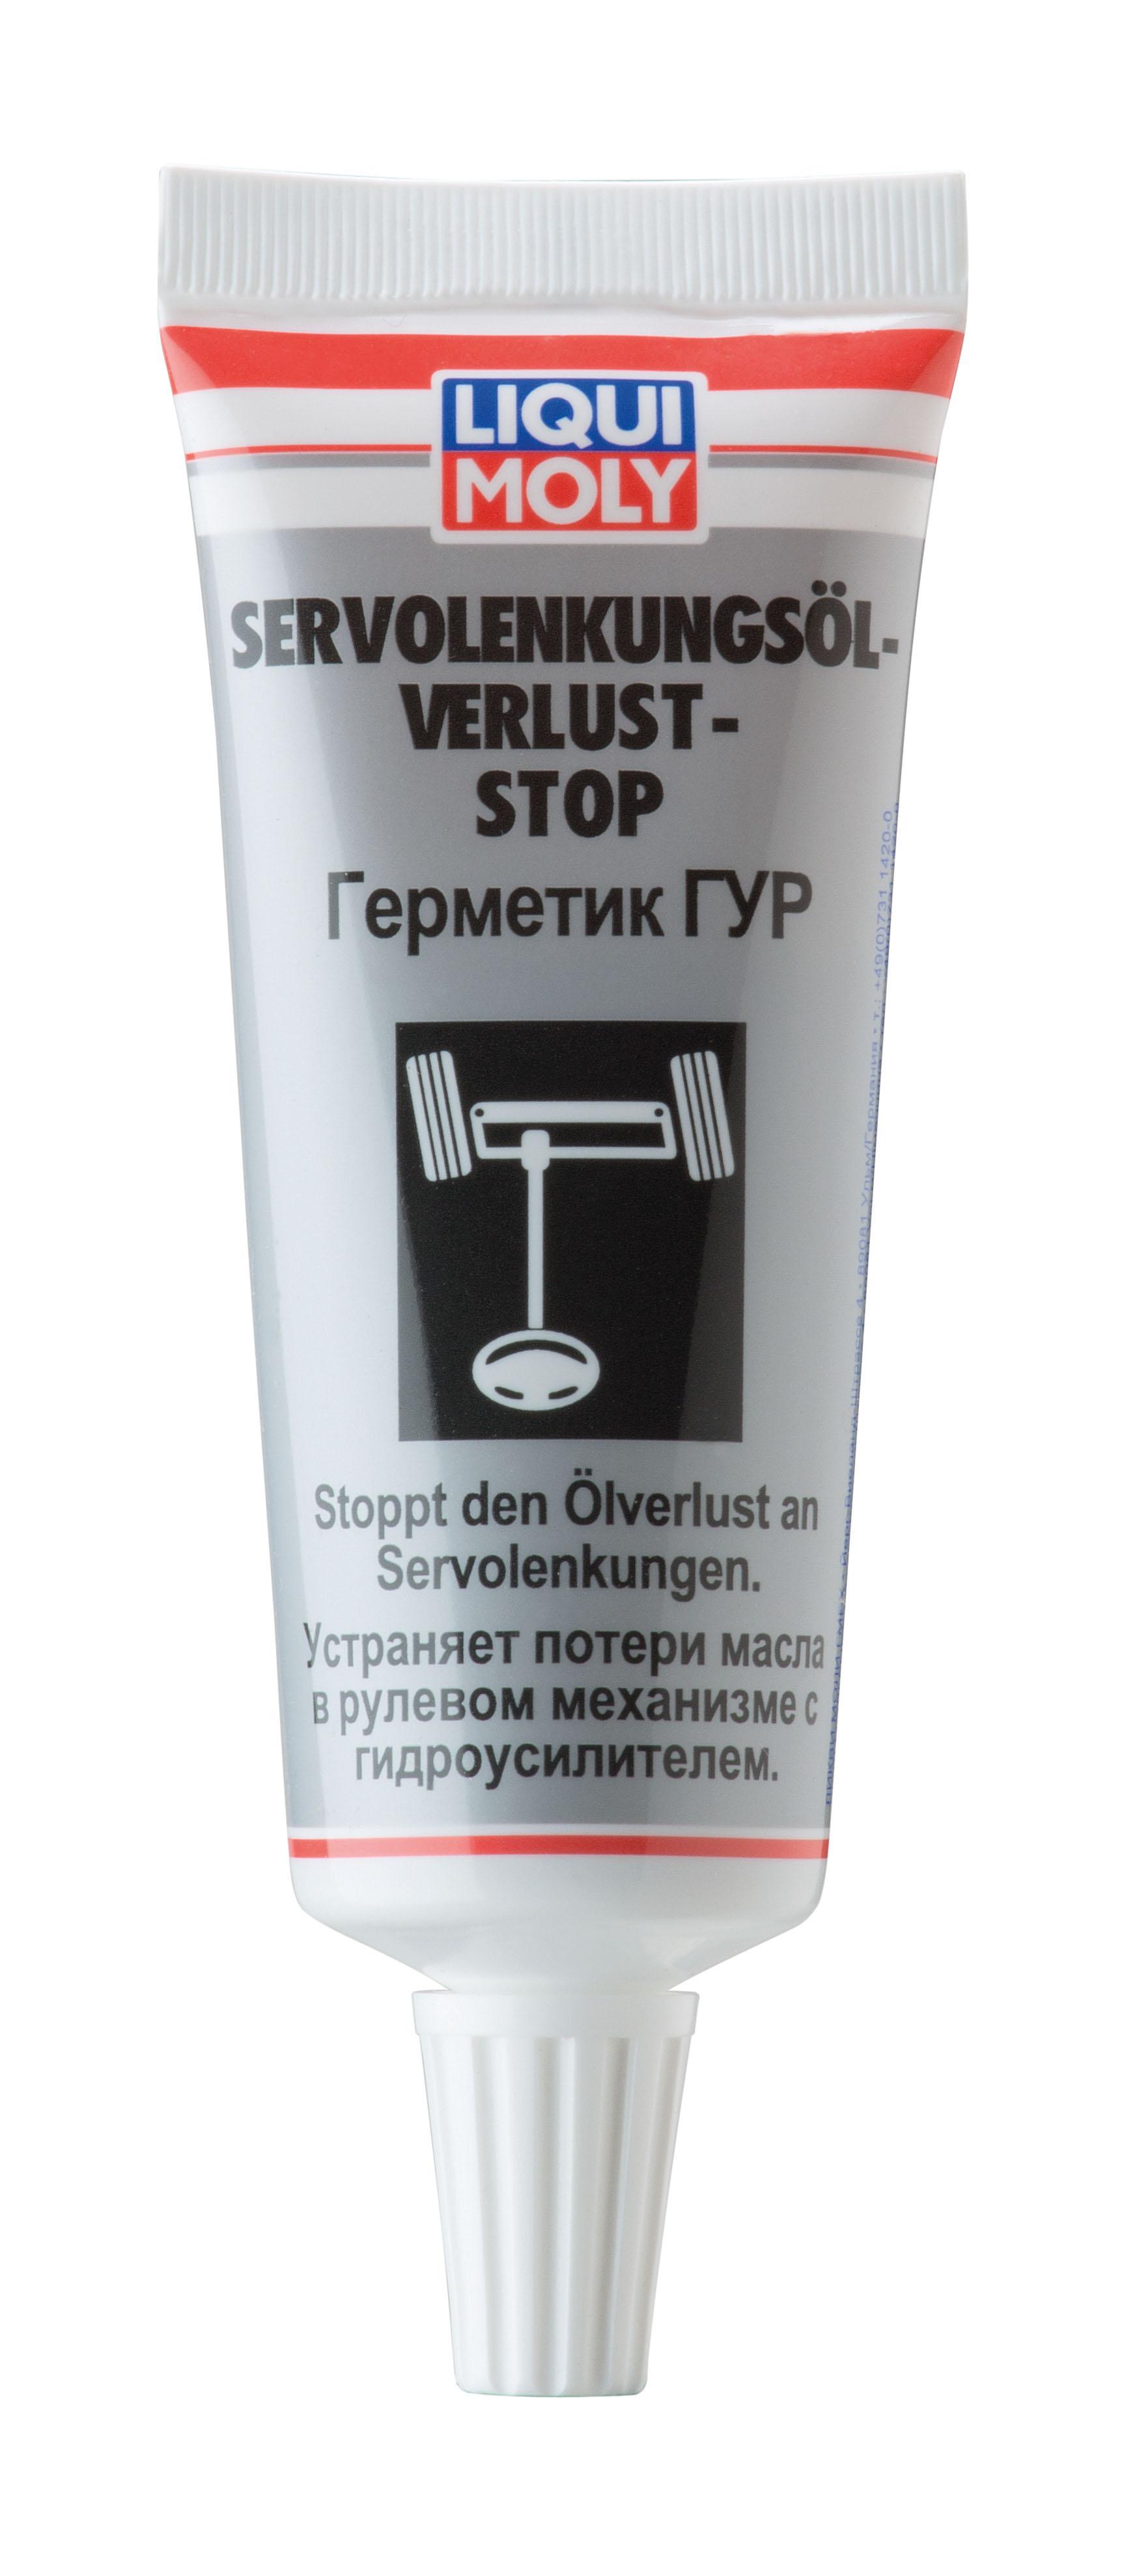 Герметик ГУР Servolenkungsoil-Verlust-Stop